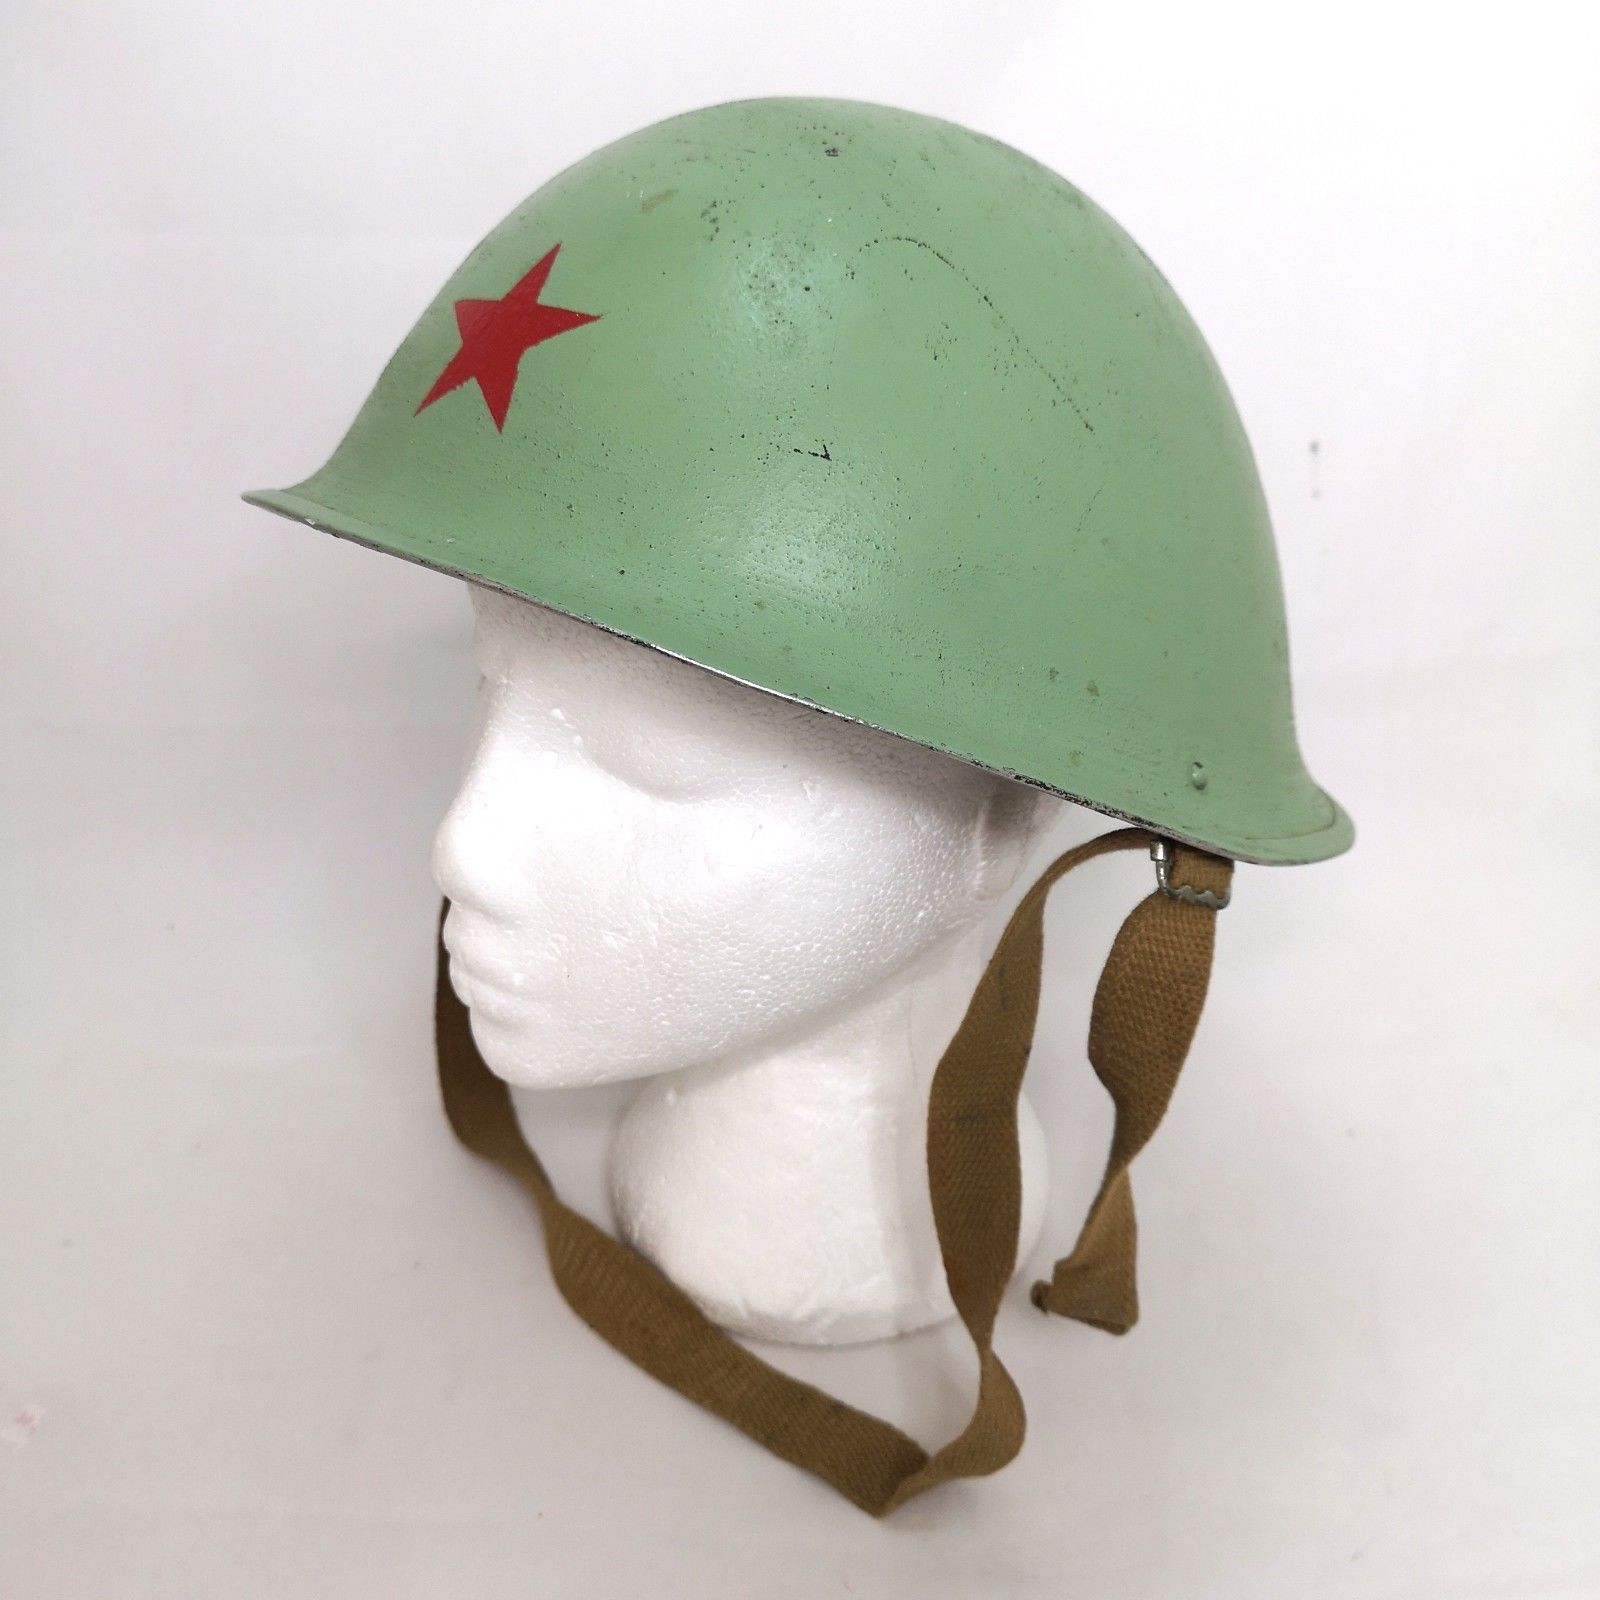 Unique British Turtle Shell Mkiv Steel Army Helmet 1954